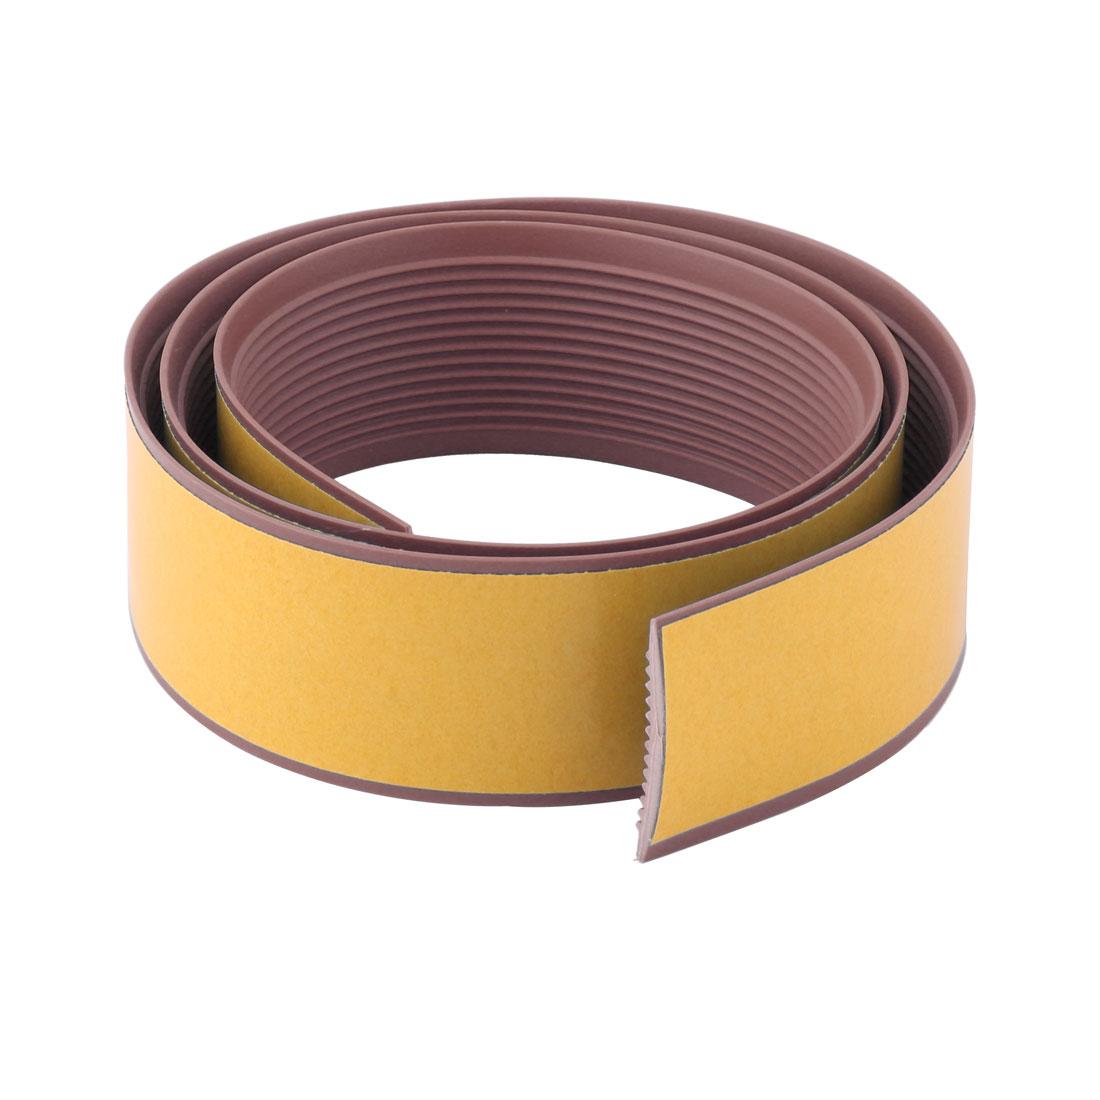 Indoor Stairs Step Floor PVC Stripe Design Anti Skid Tape Coffee Color 3.3 Ft